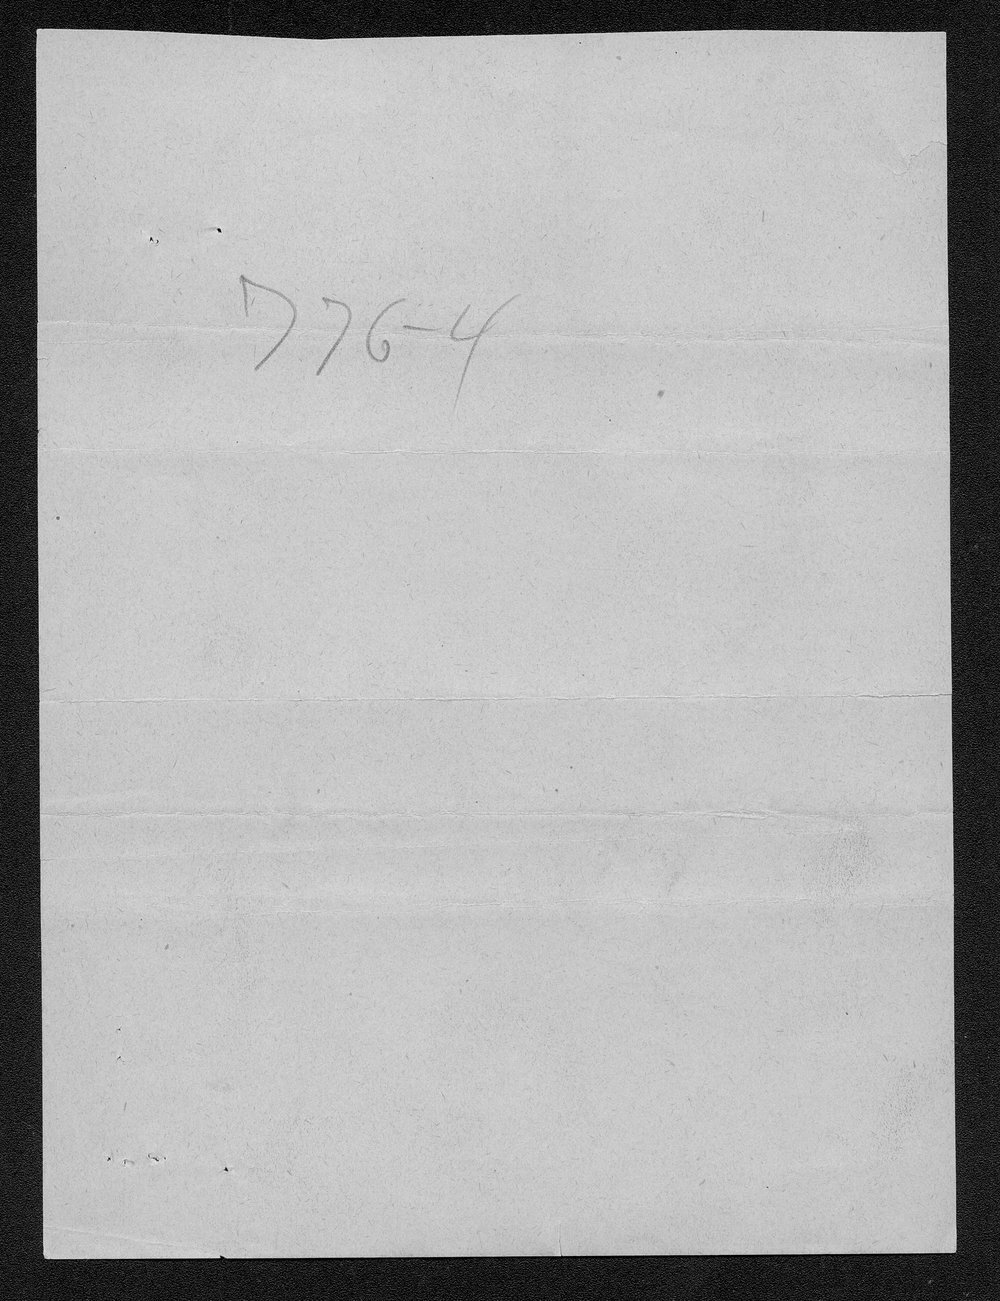 Governor Thomas Osborn Indian affairs received correspondence - 11